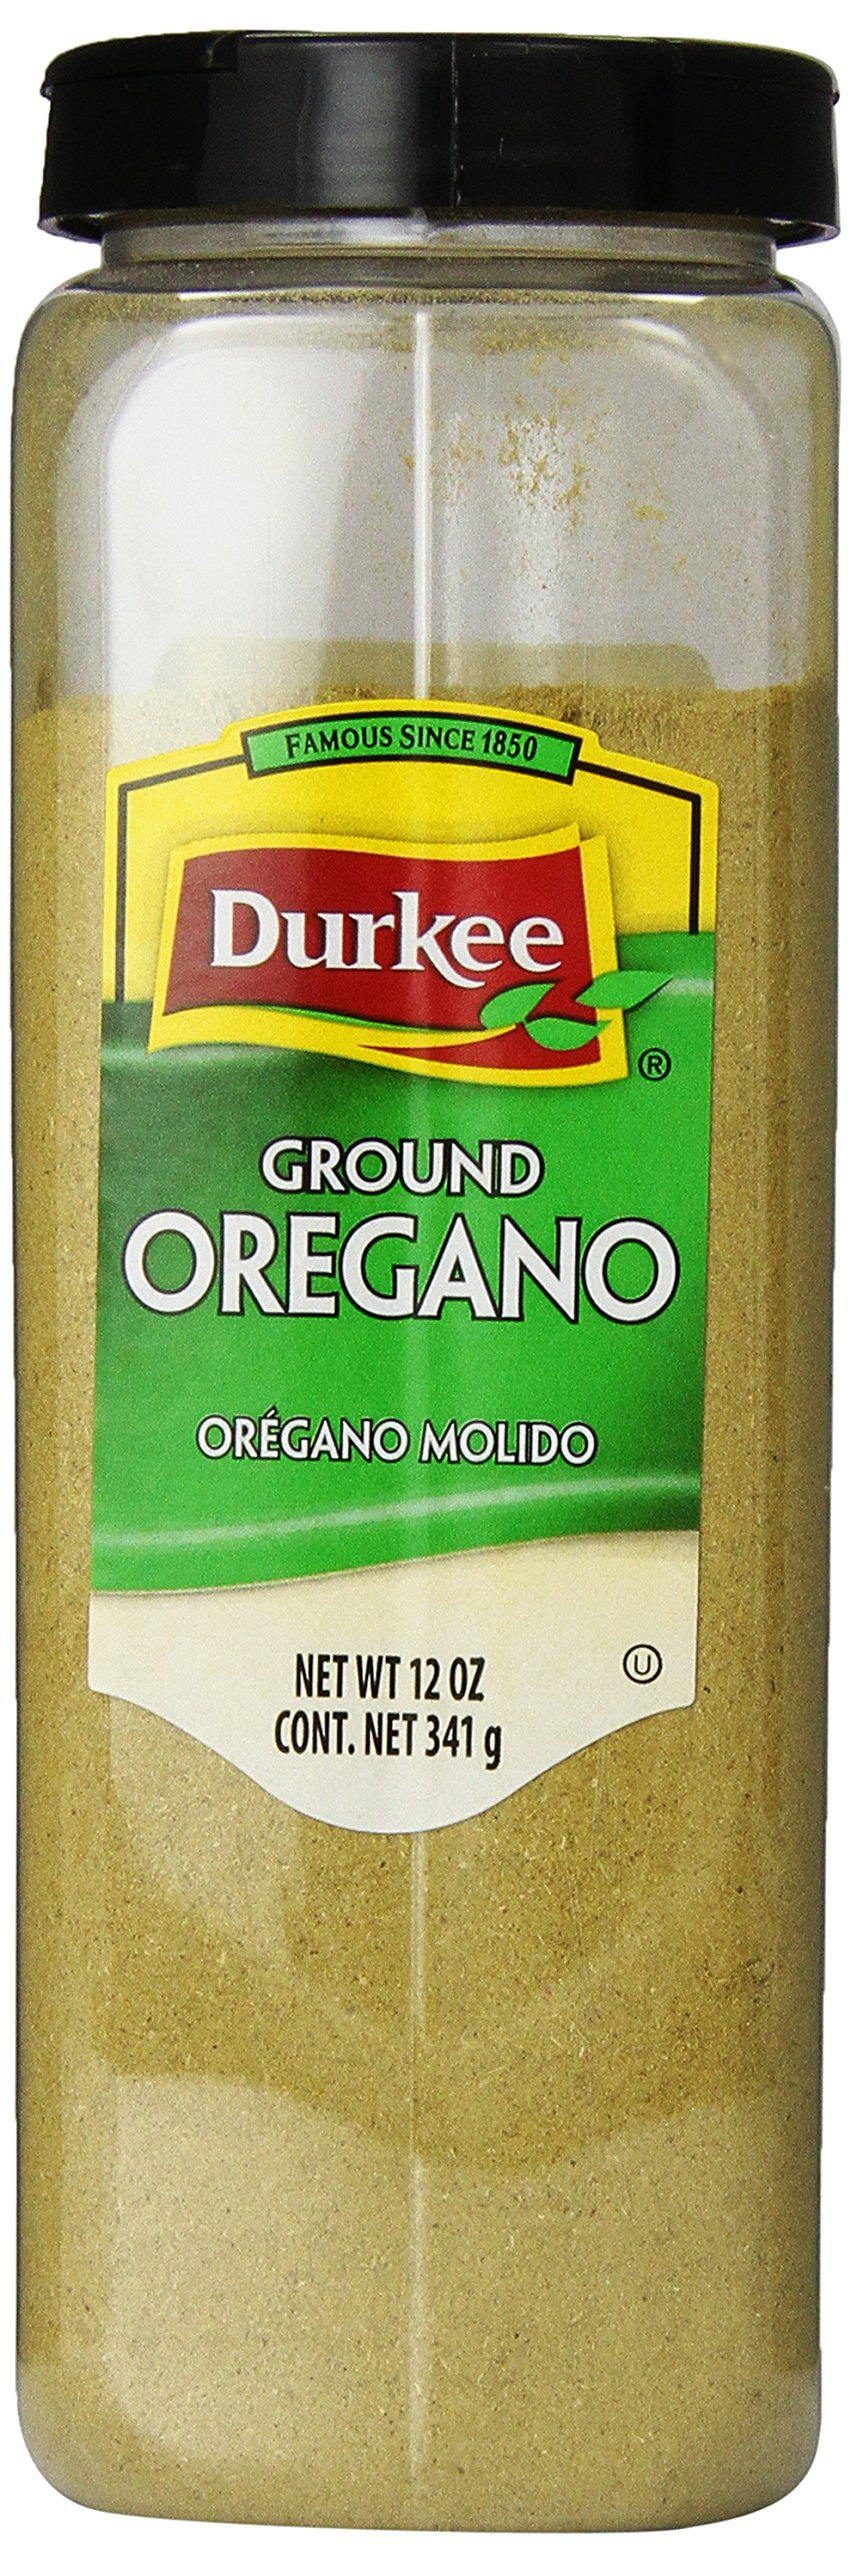 Durkee Ground Oregano, Ground, 12-Ounce